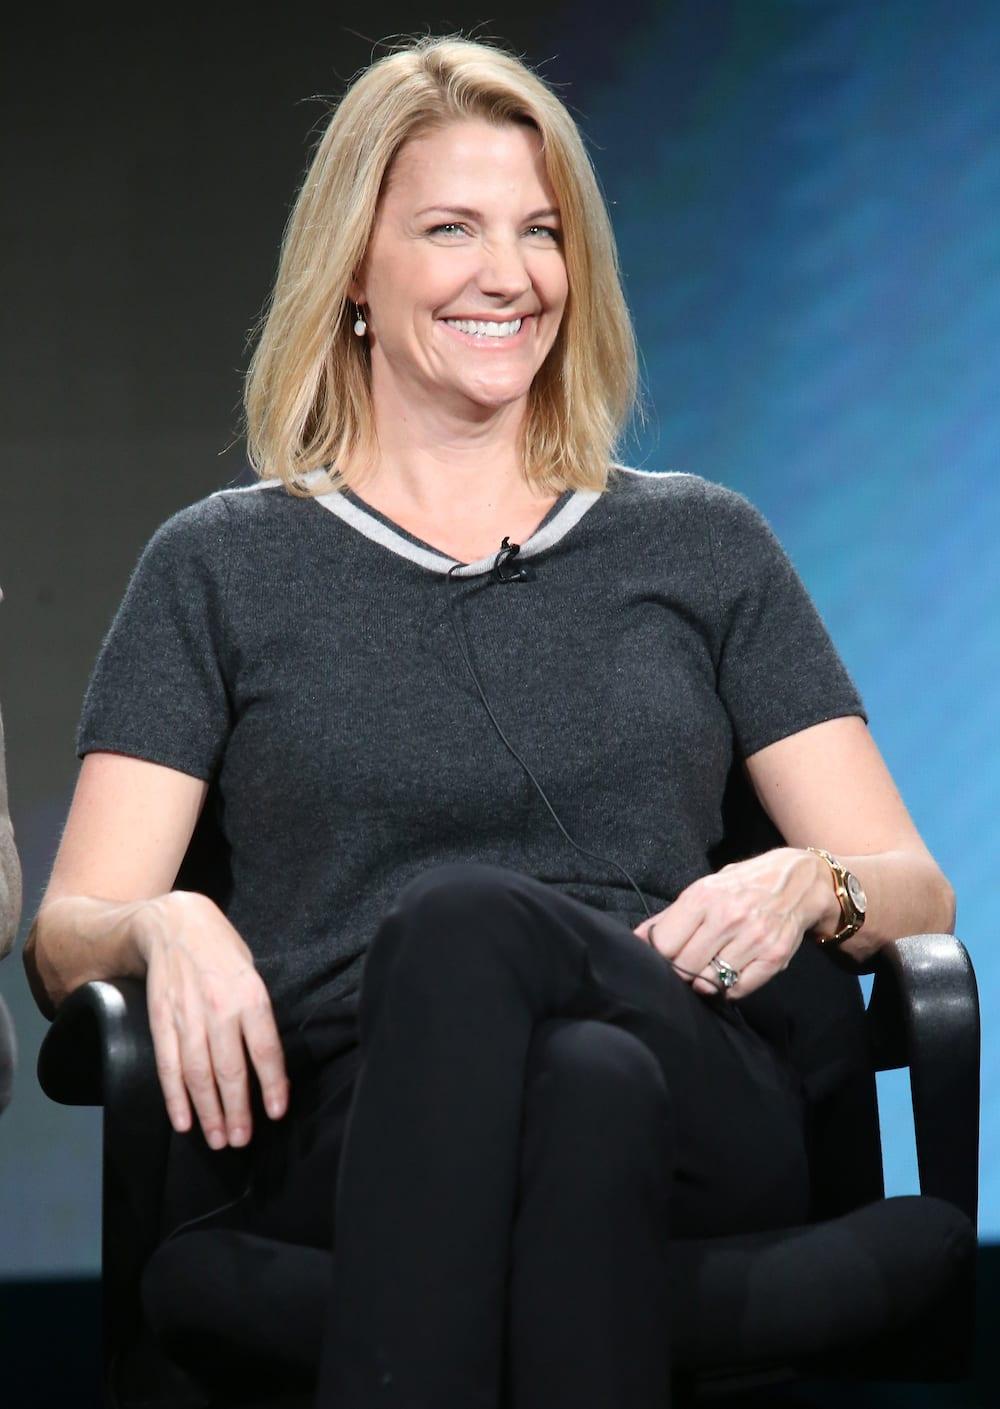 Steve Carell wife, Nancy Carell